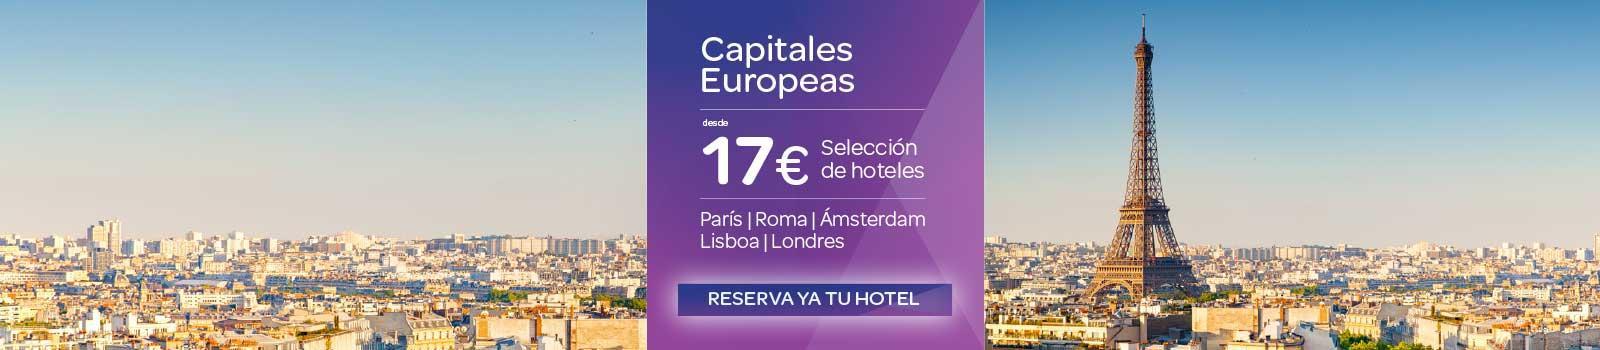 Oferta Hoteles Capitales Europeas